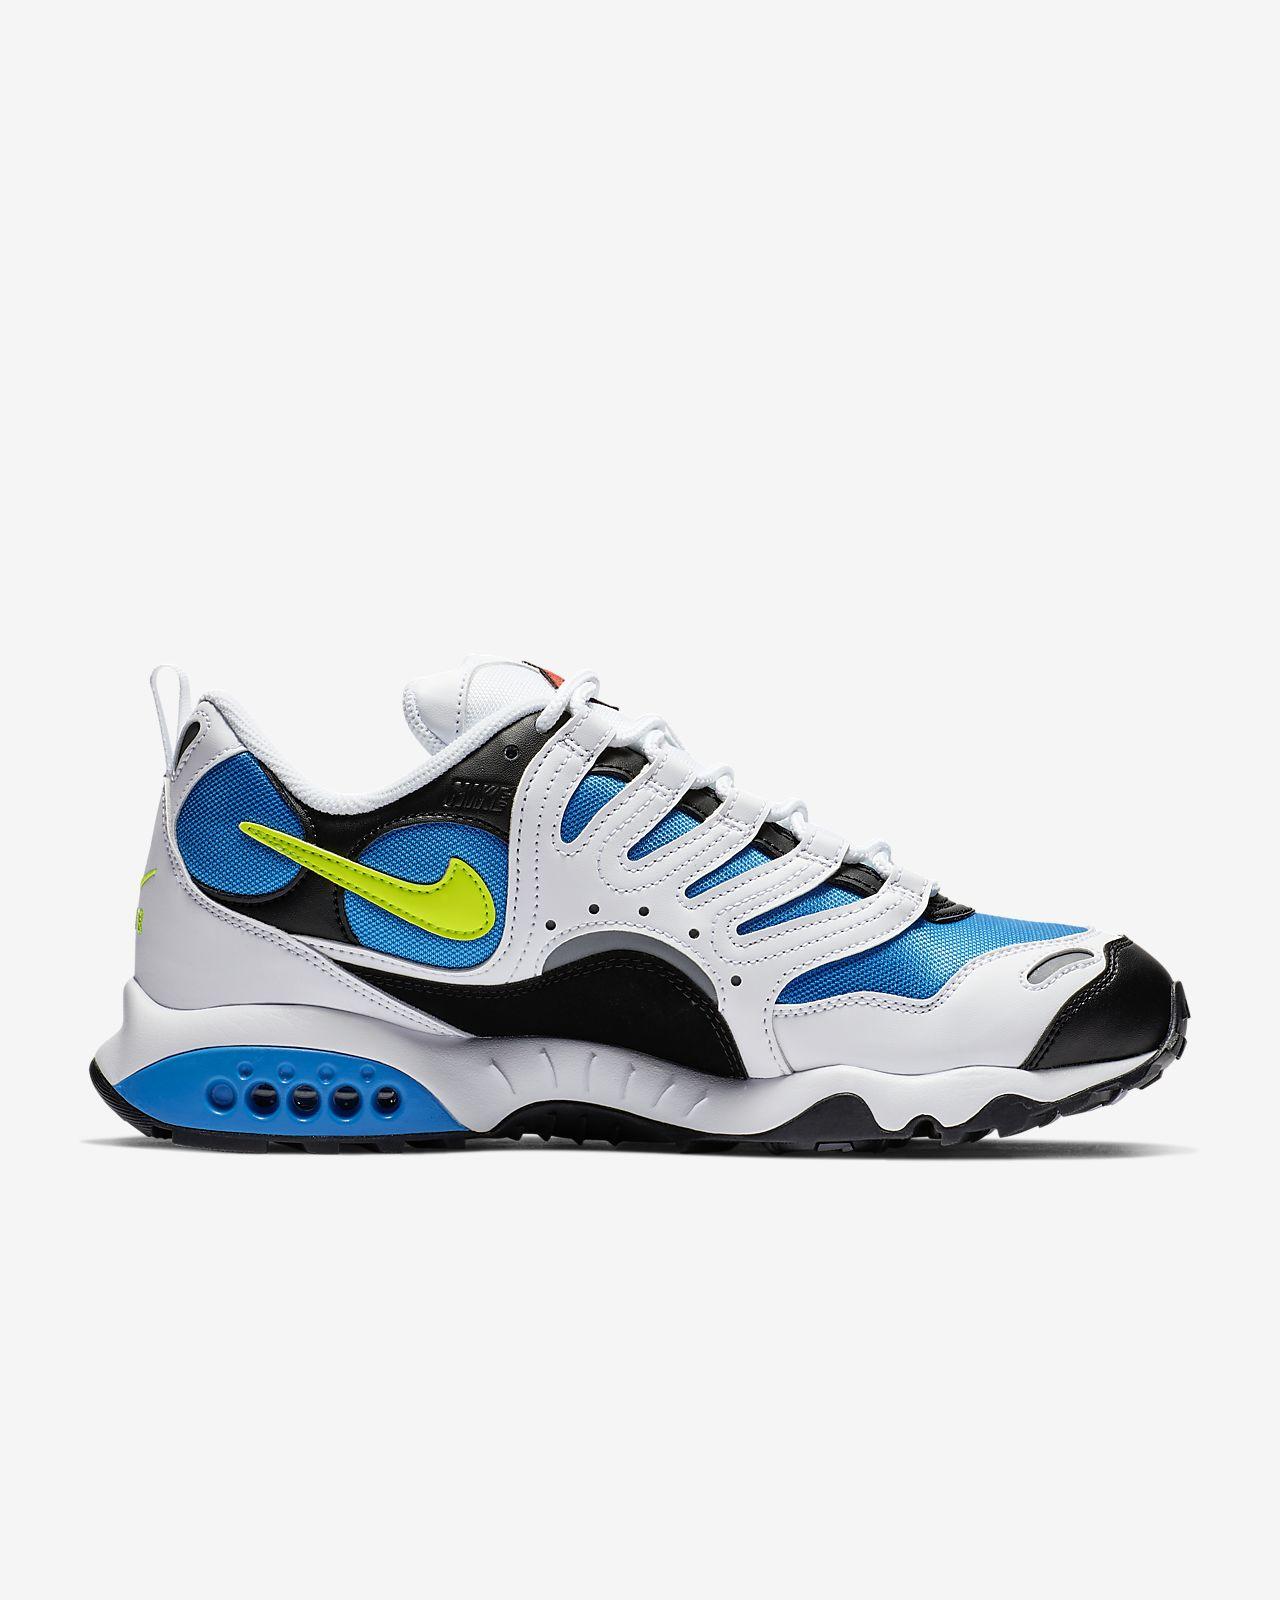 sports shoes 8faf4 cc092 Nike Air Terra Humara 18 Men's Shoe. Nike.com